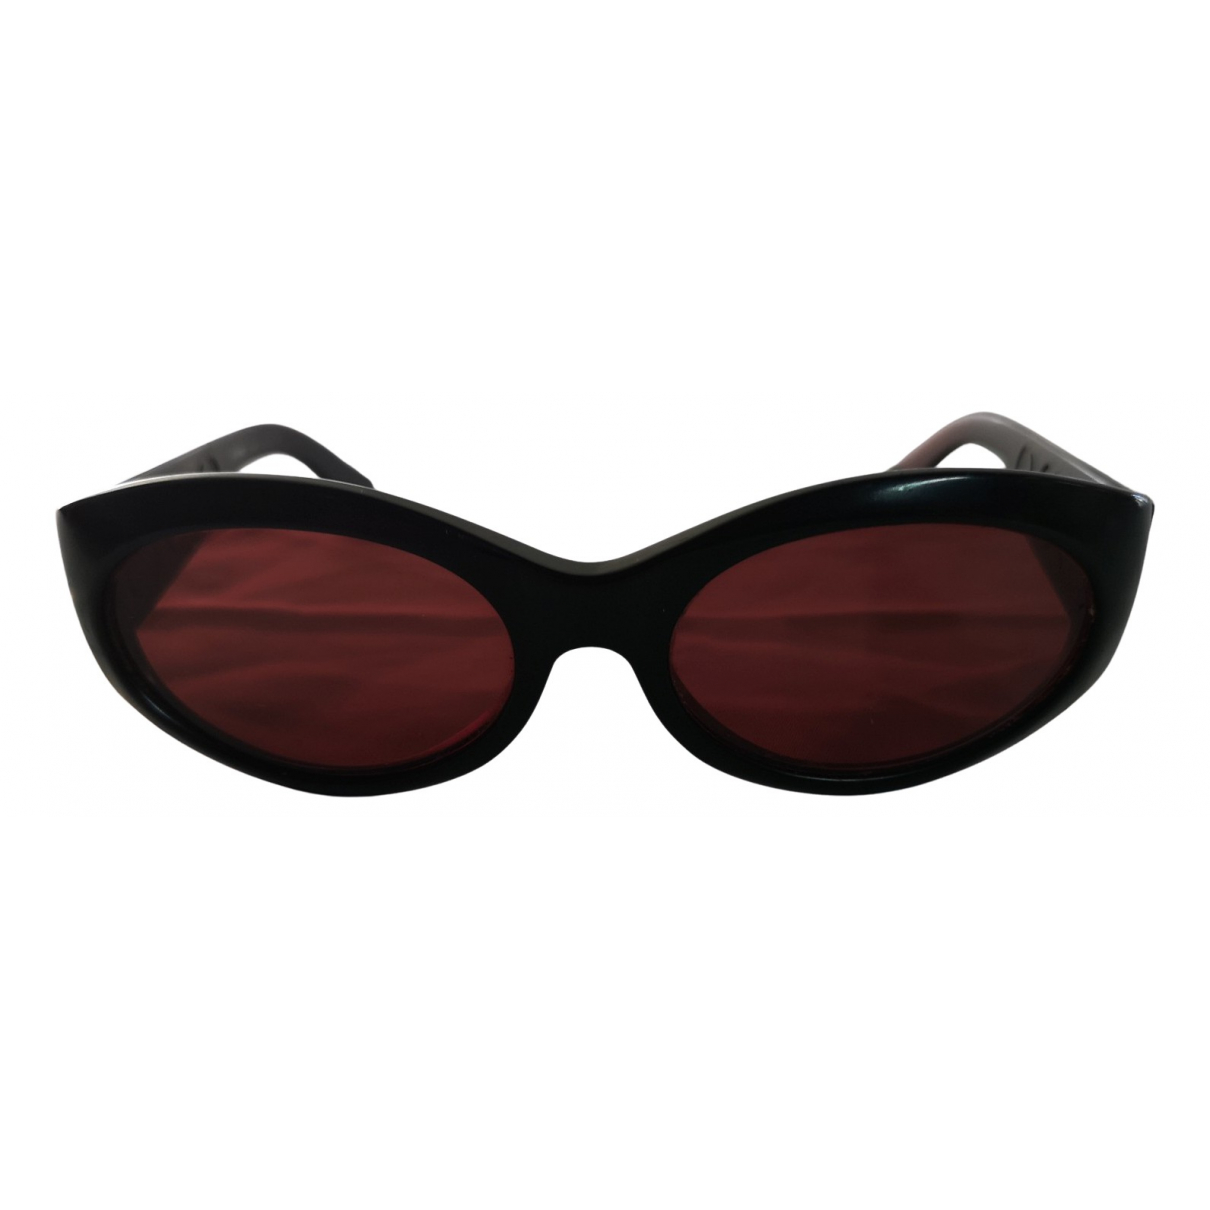 Fendi N Black Sunglasses for Women N